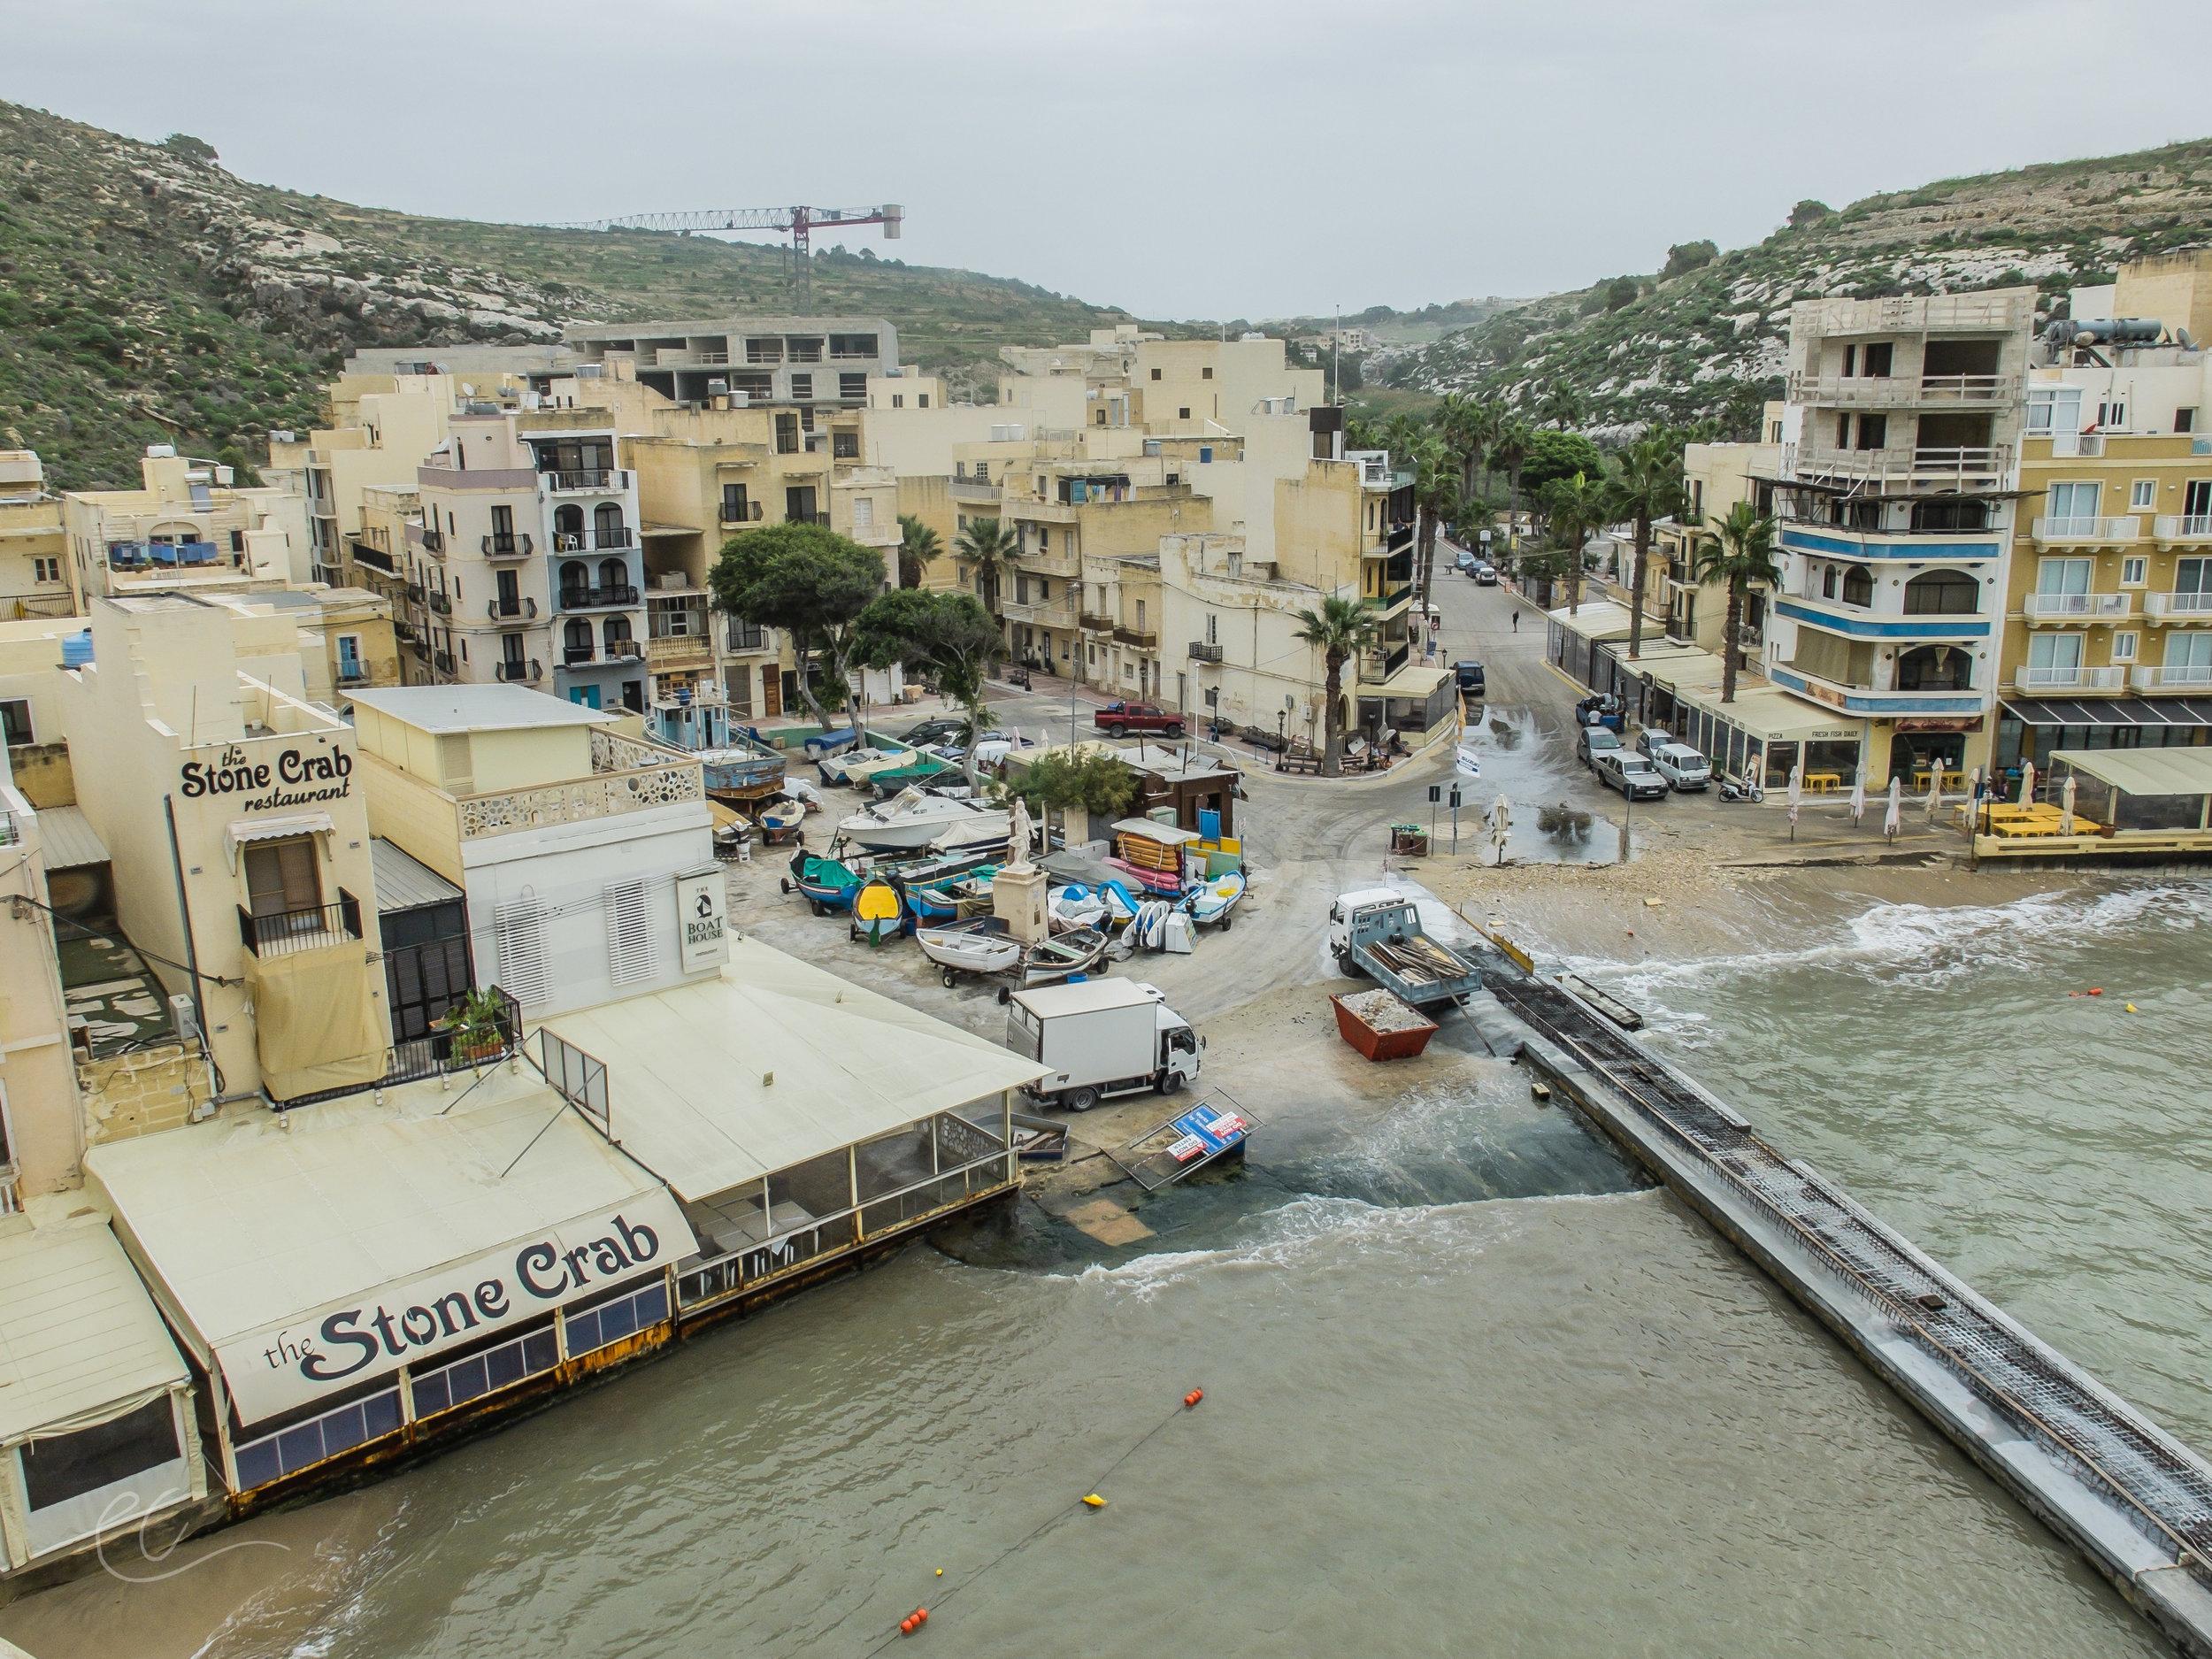 malta-travel-23.jpg